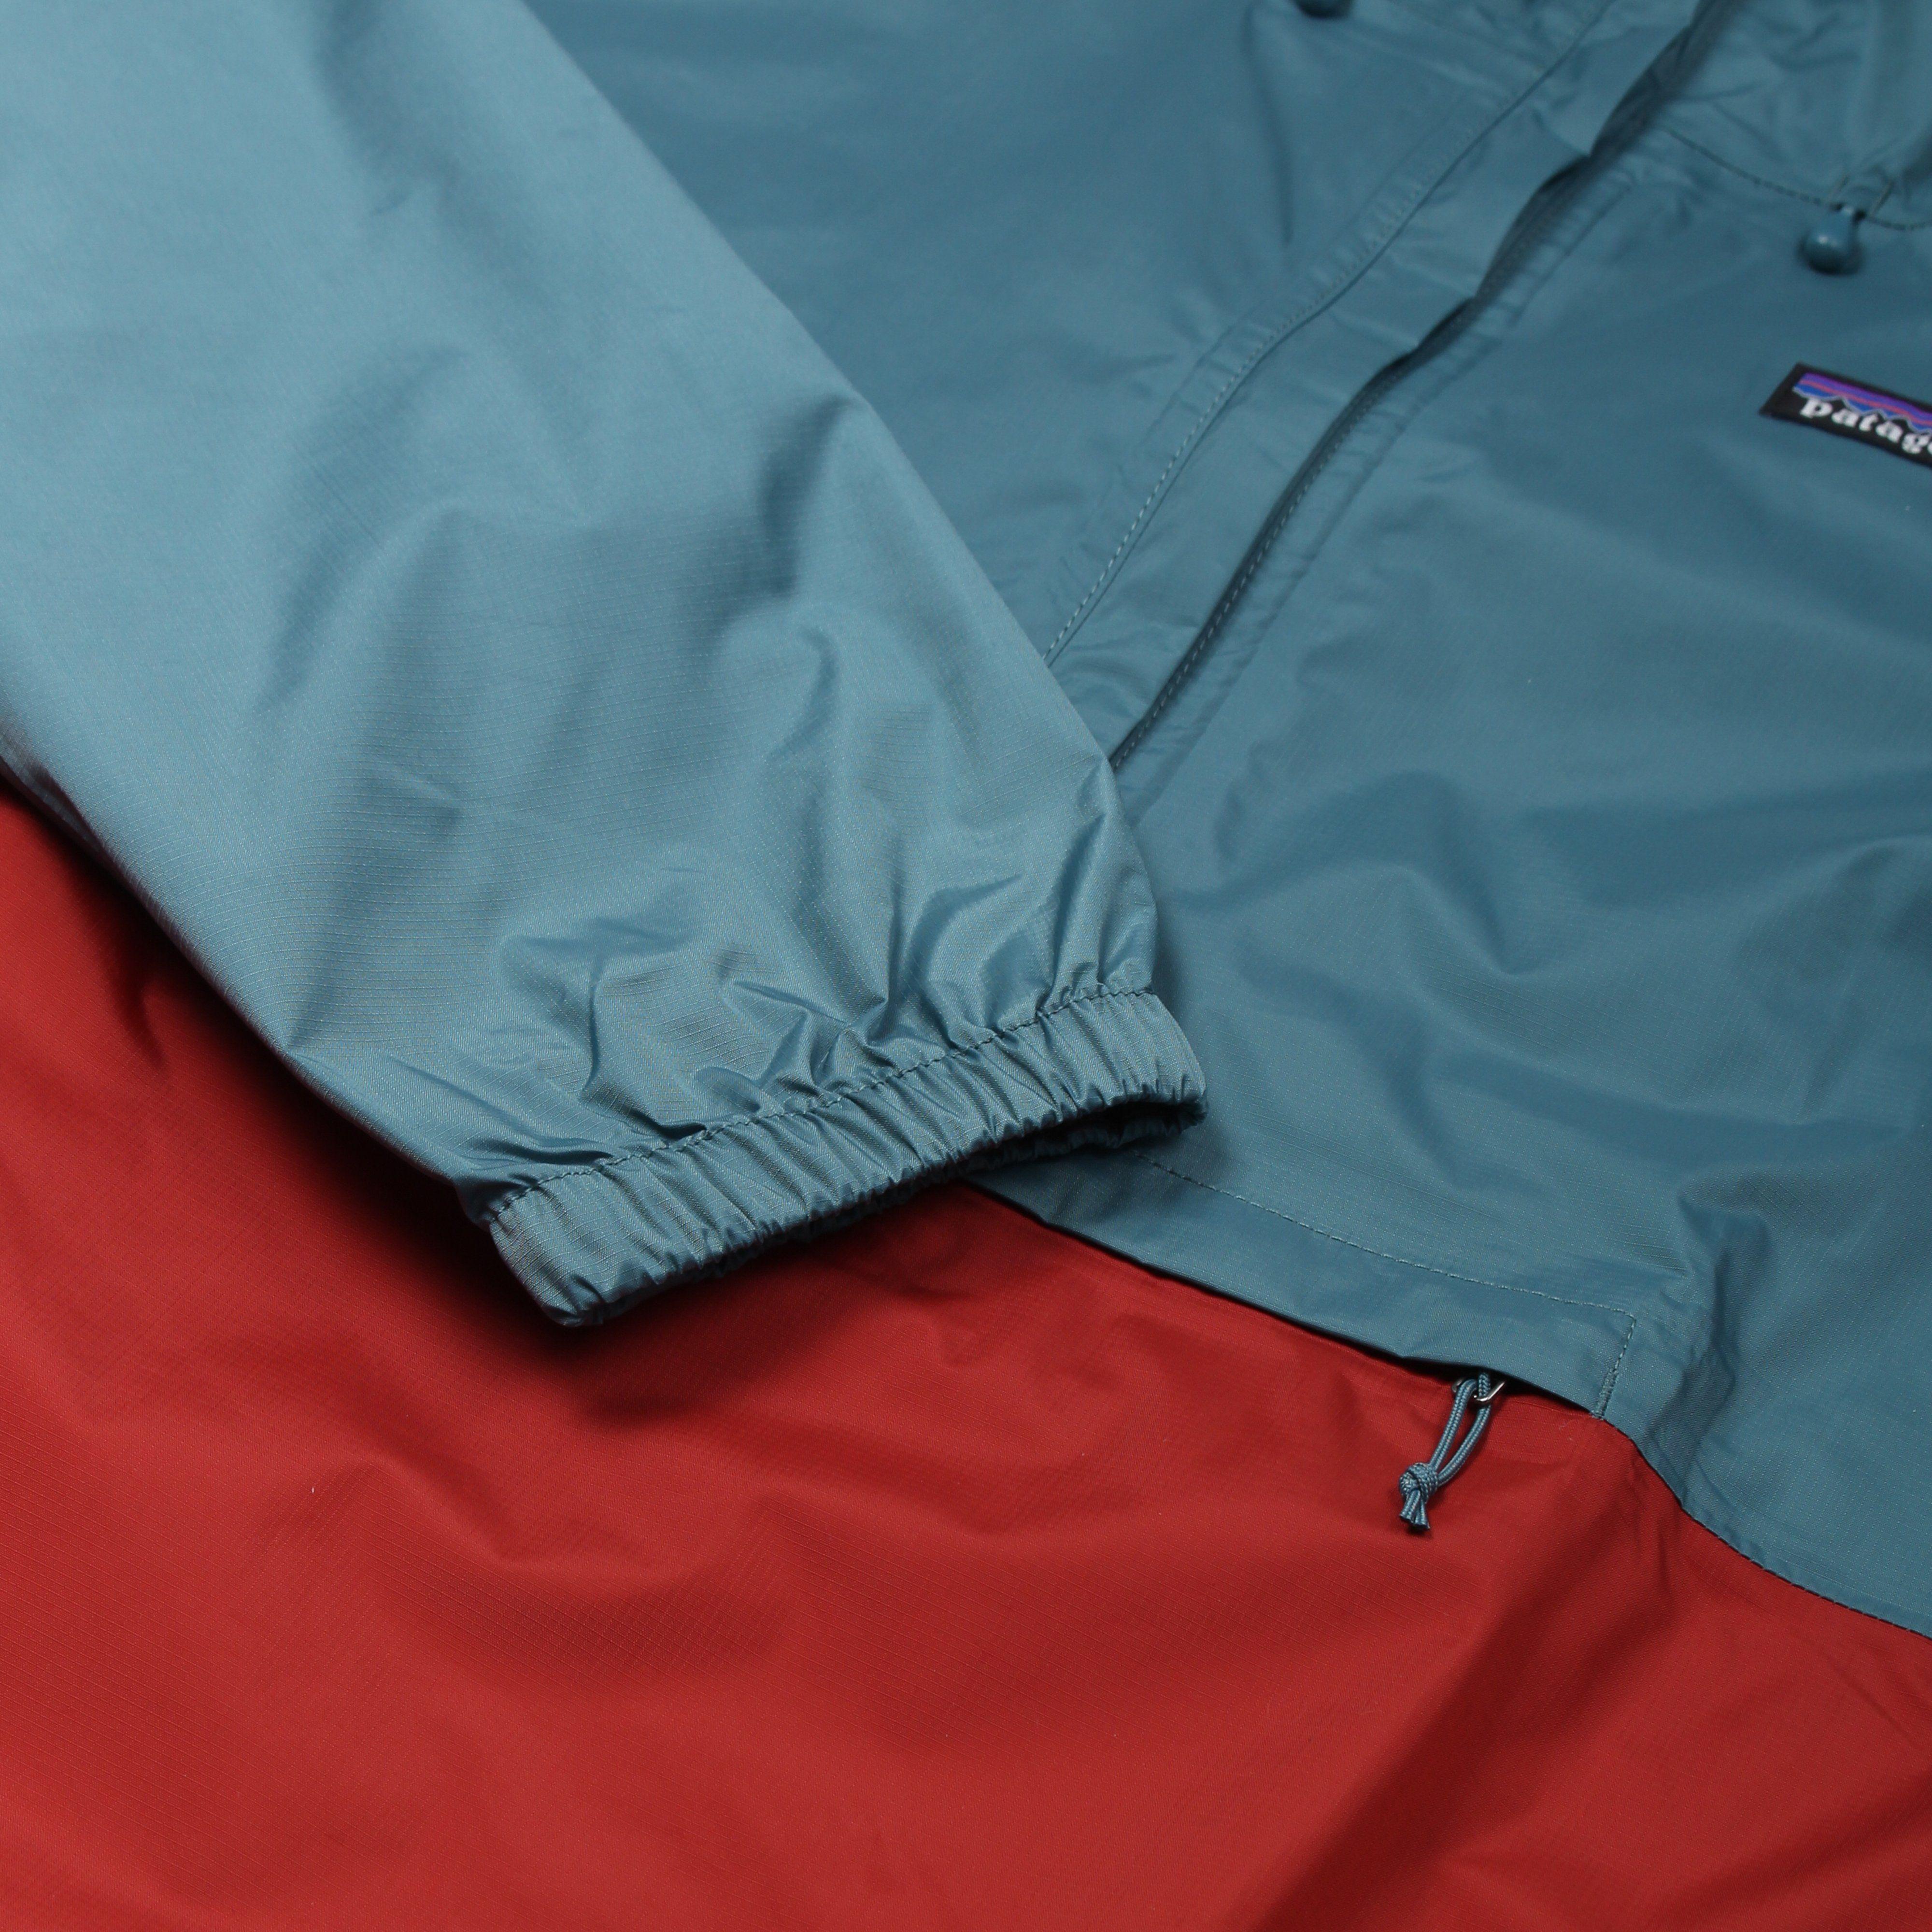 Patagonia Torrentshell Pullover Jacket